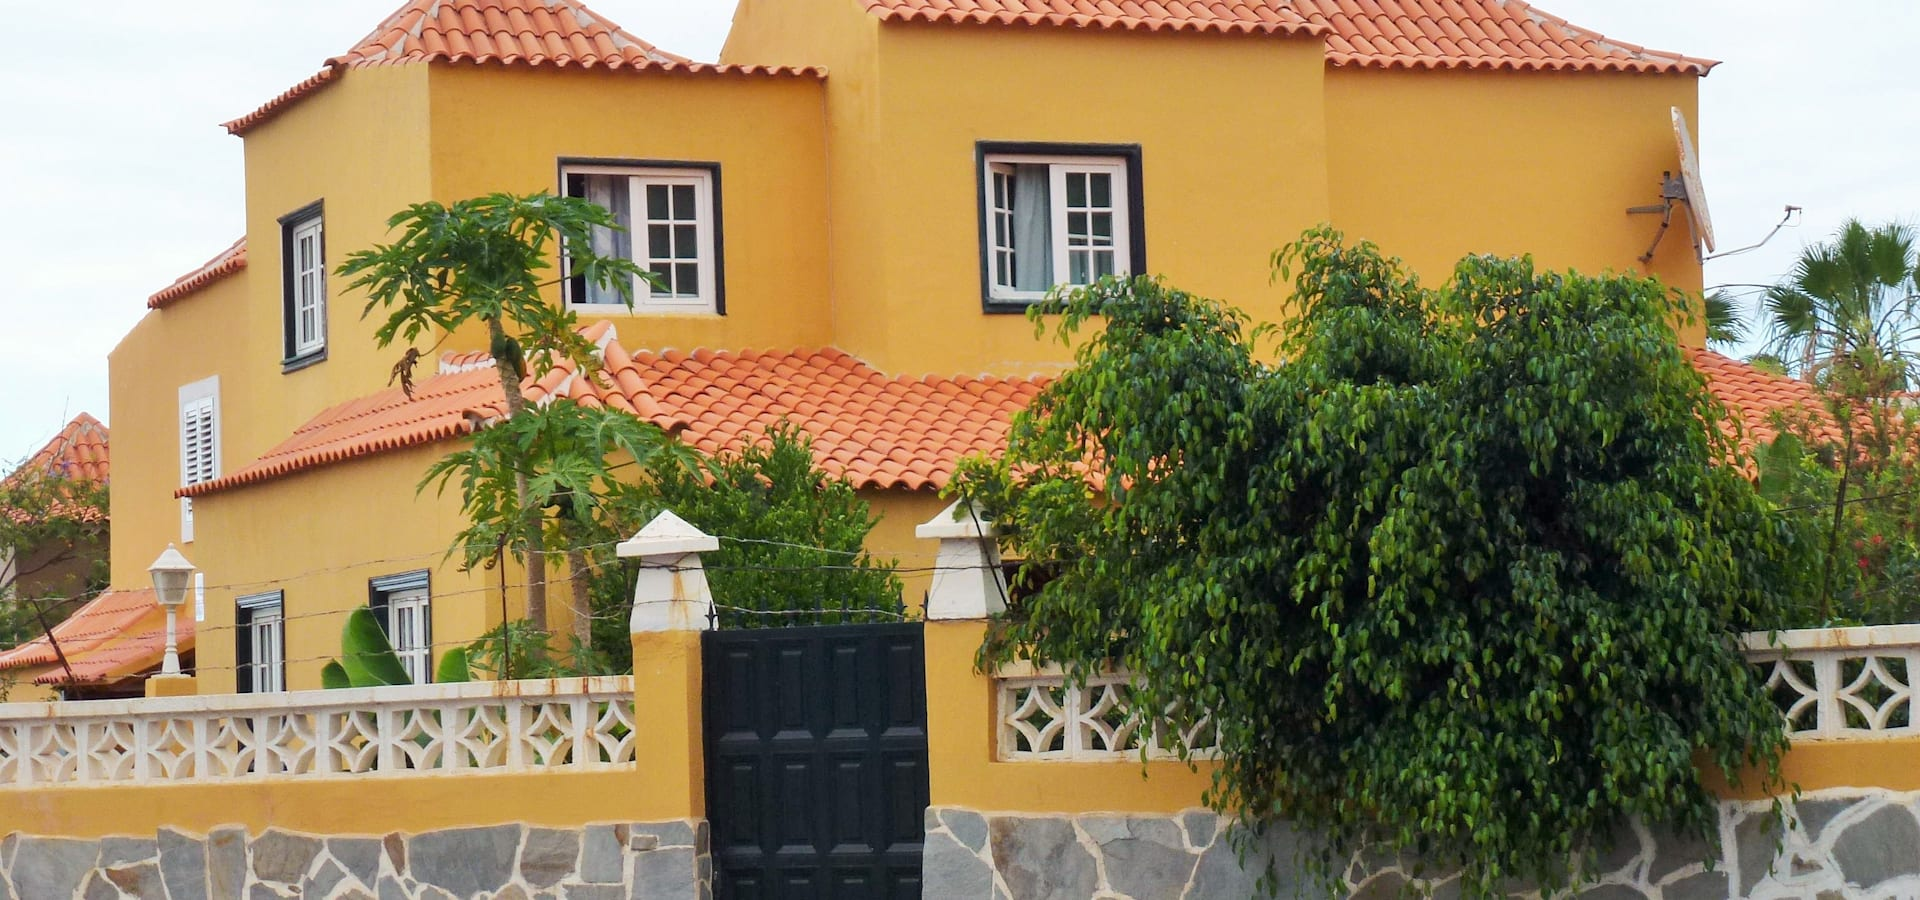 Home Staging Tenerife 360º- Idoia Askasibar